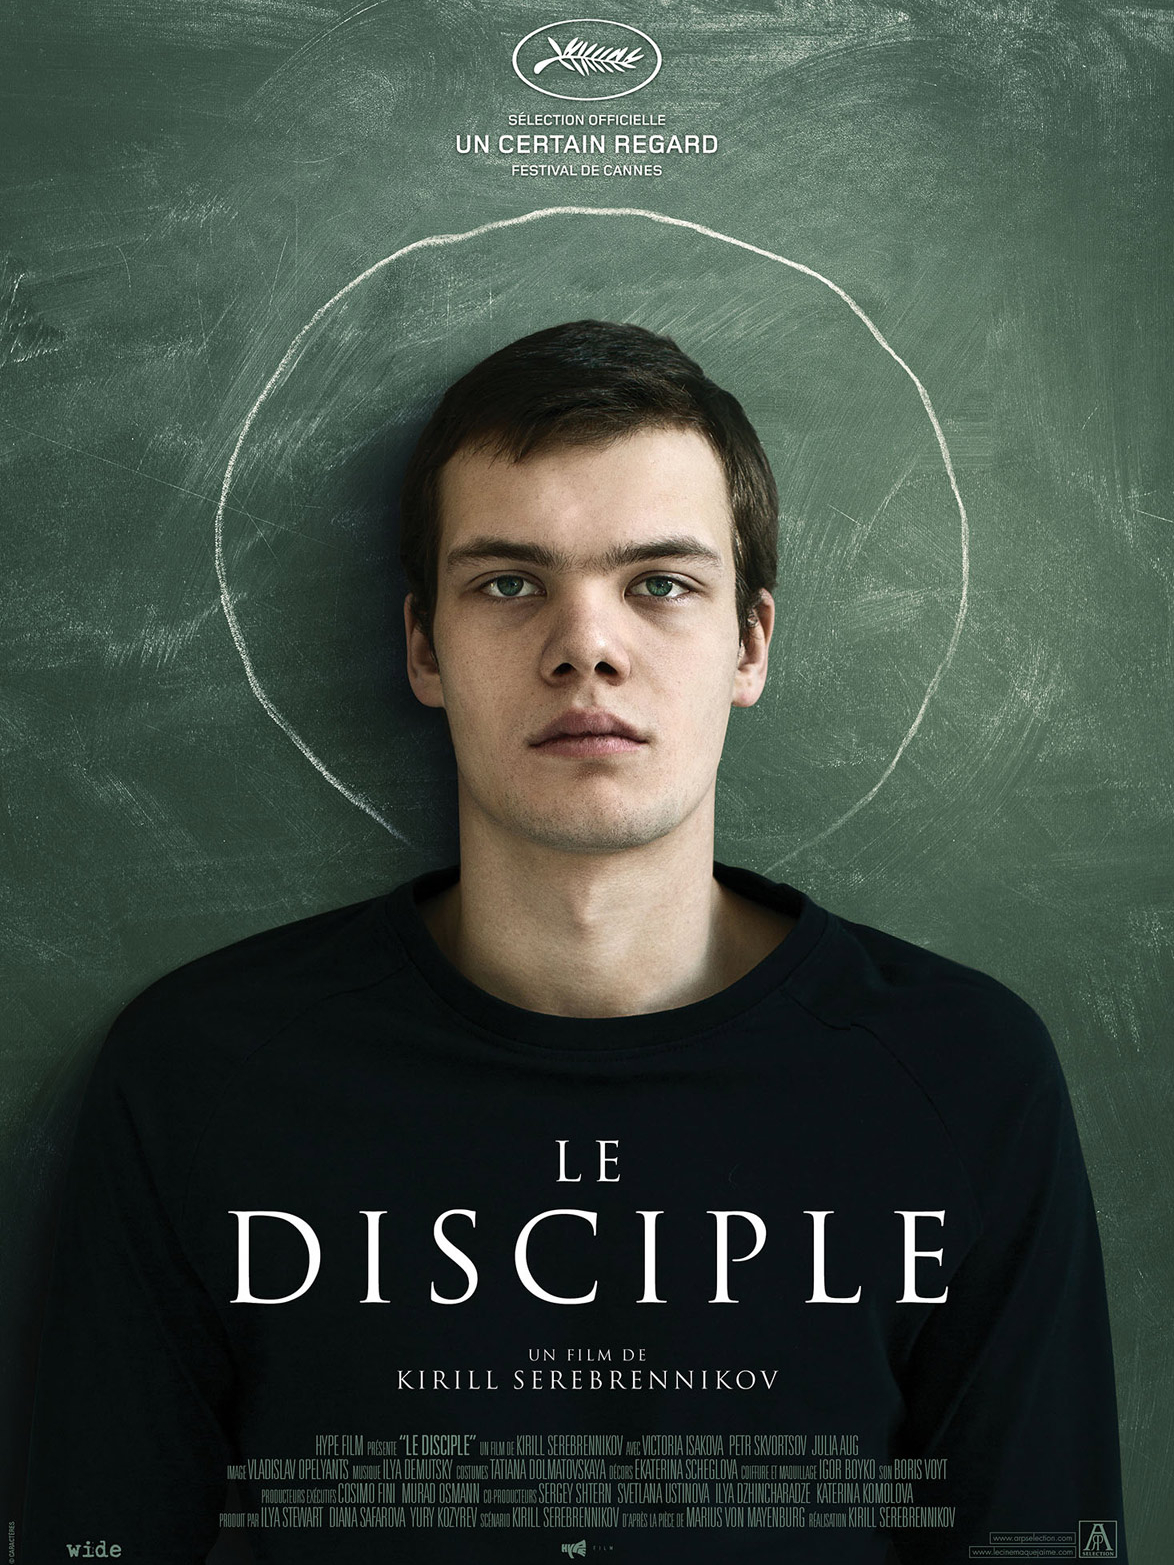 Le Disciple | Serebrennikov, Kirill (Réalisateur)